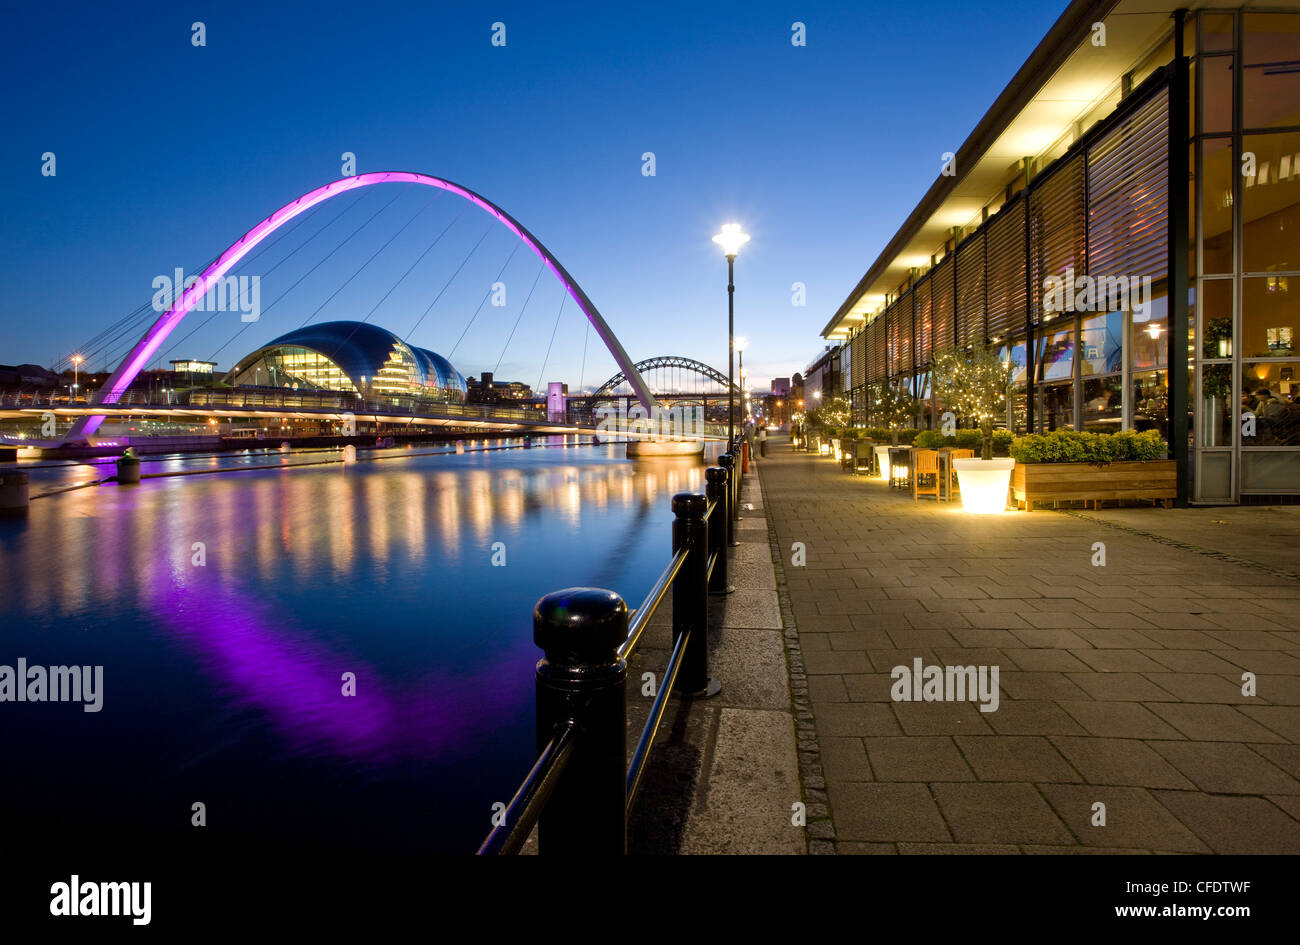 Newcastle Quayside, Gateshead Millennium Bridge e il ponte ad arcate, Newcastle-upon-Tyne, Tyne and Wear, England, Immagini Stock